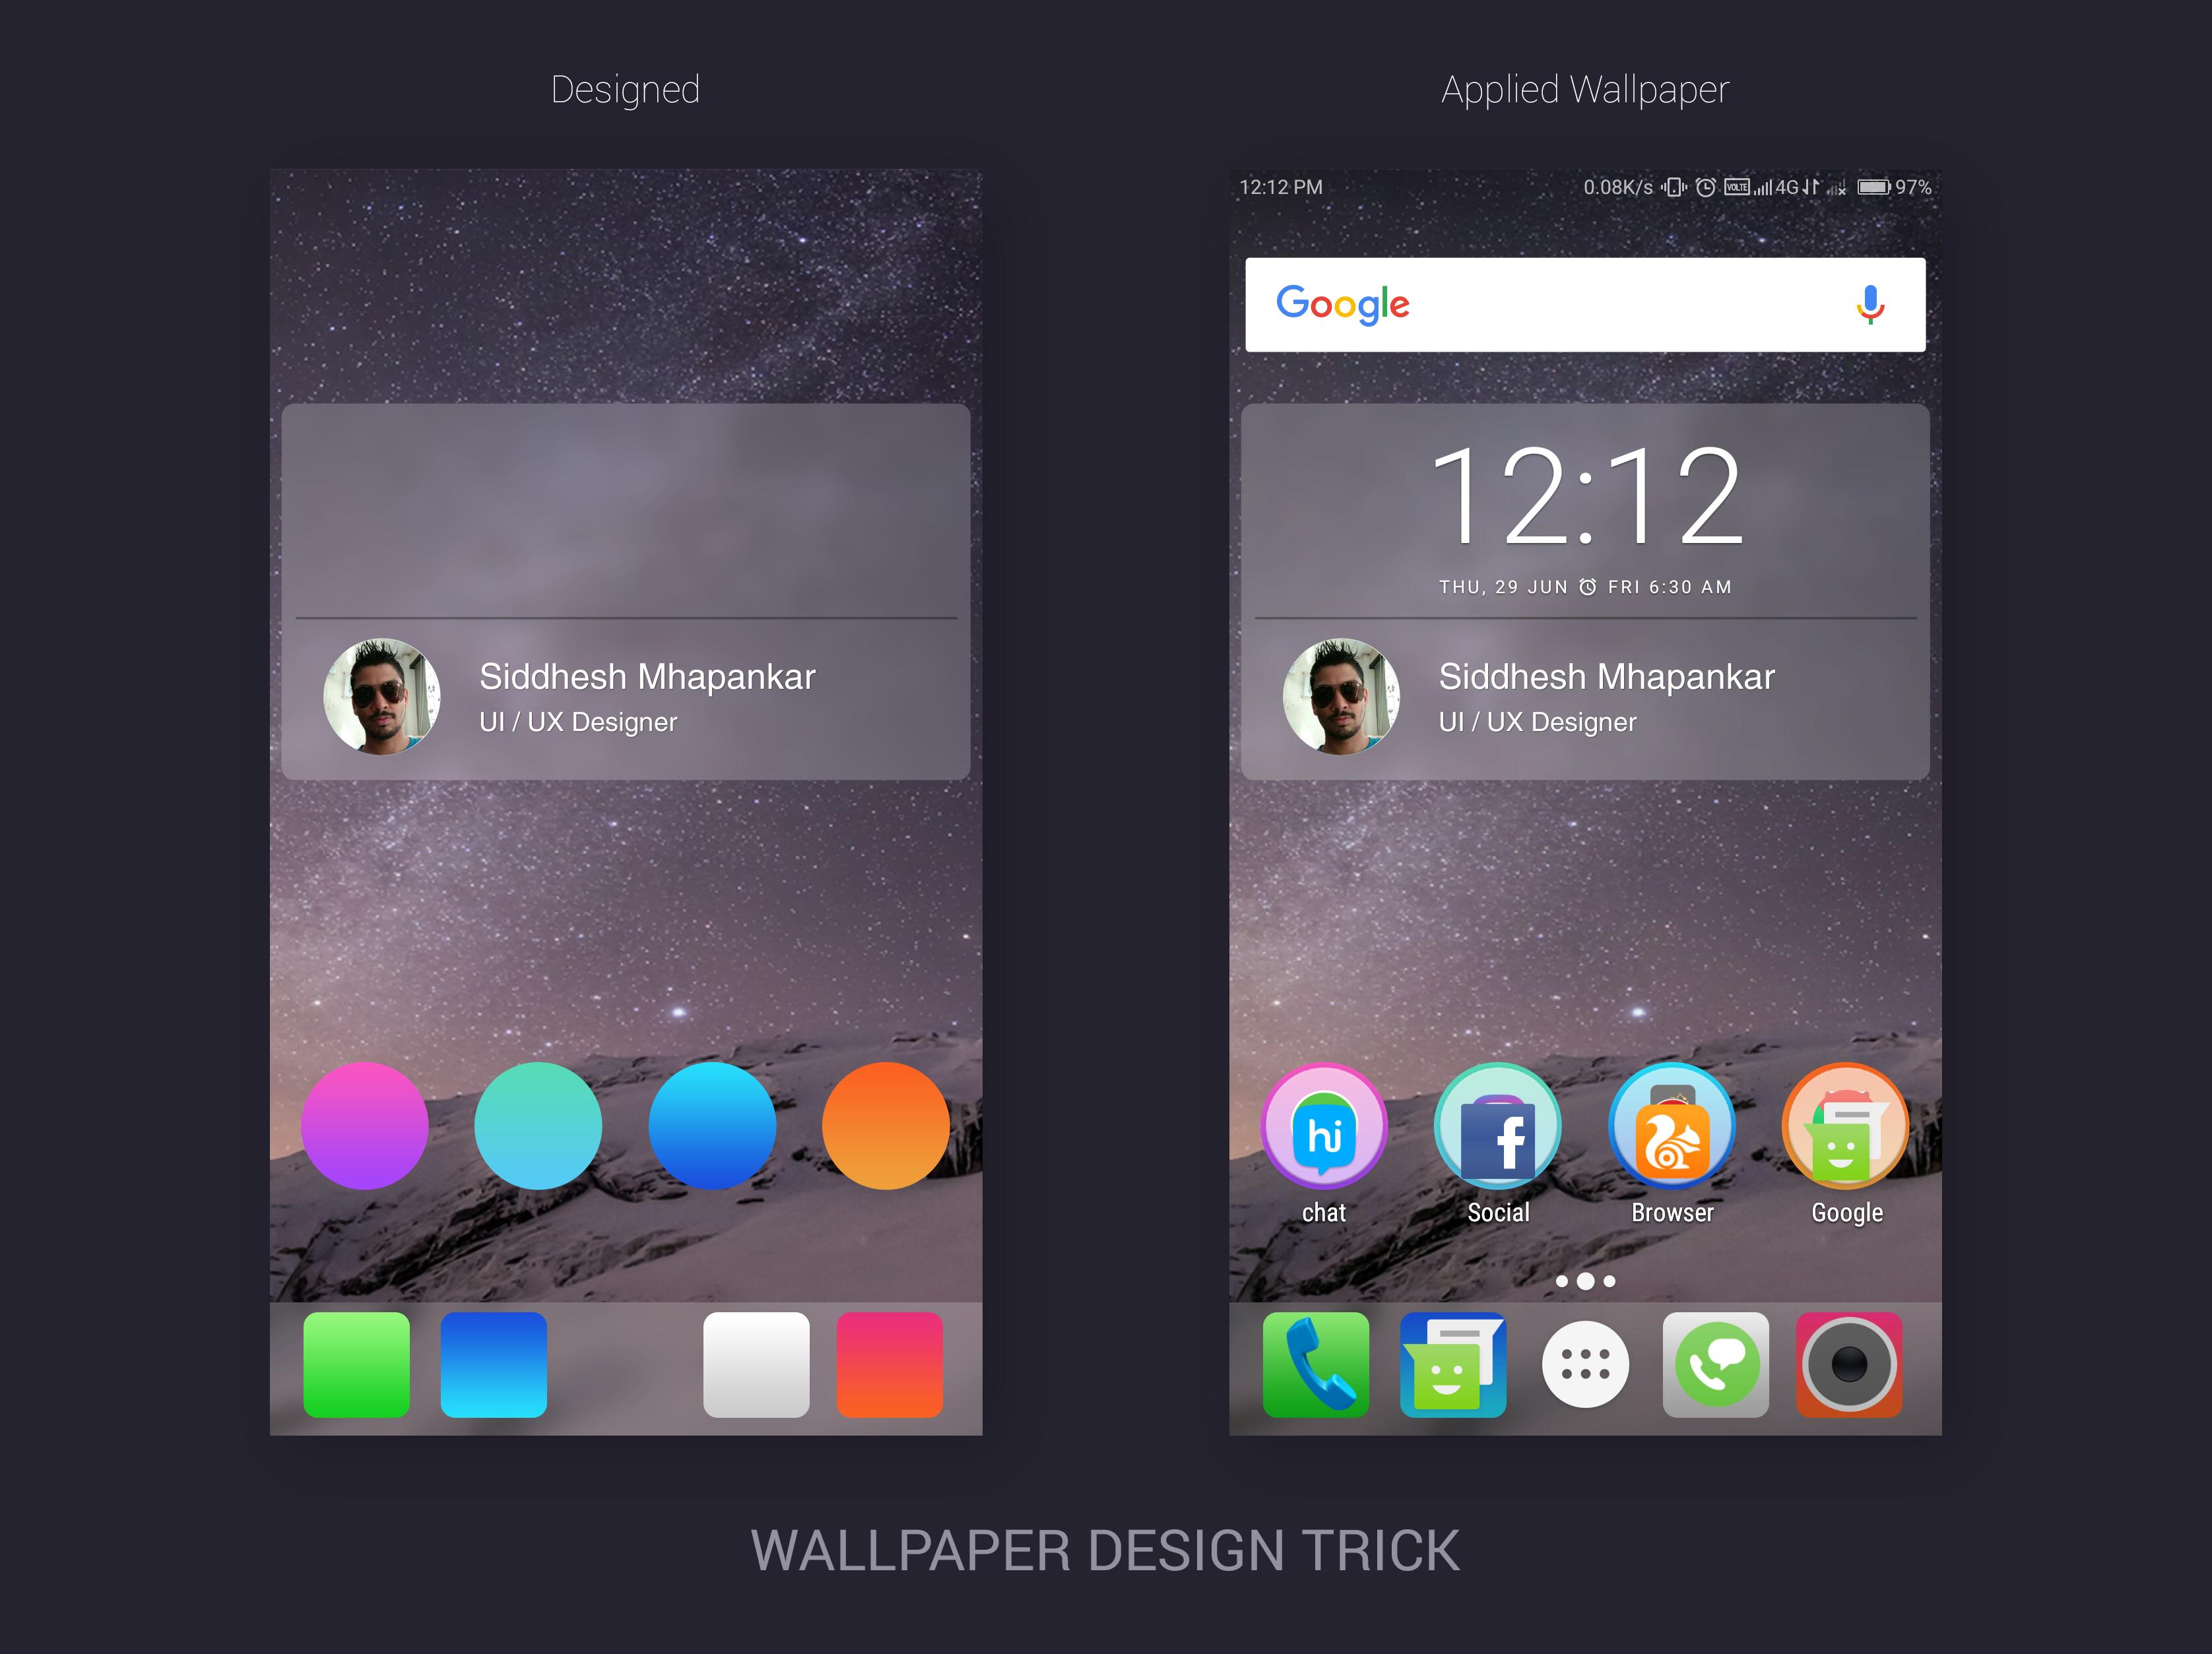 Wallpaper Design Trick For Phones